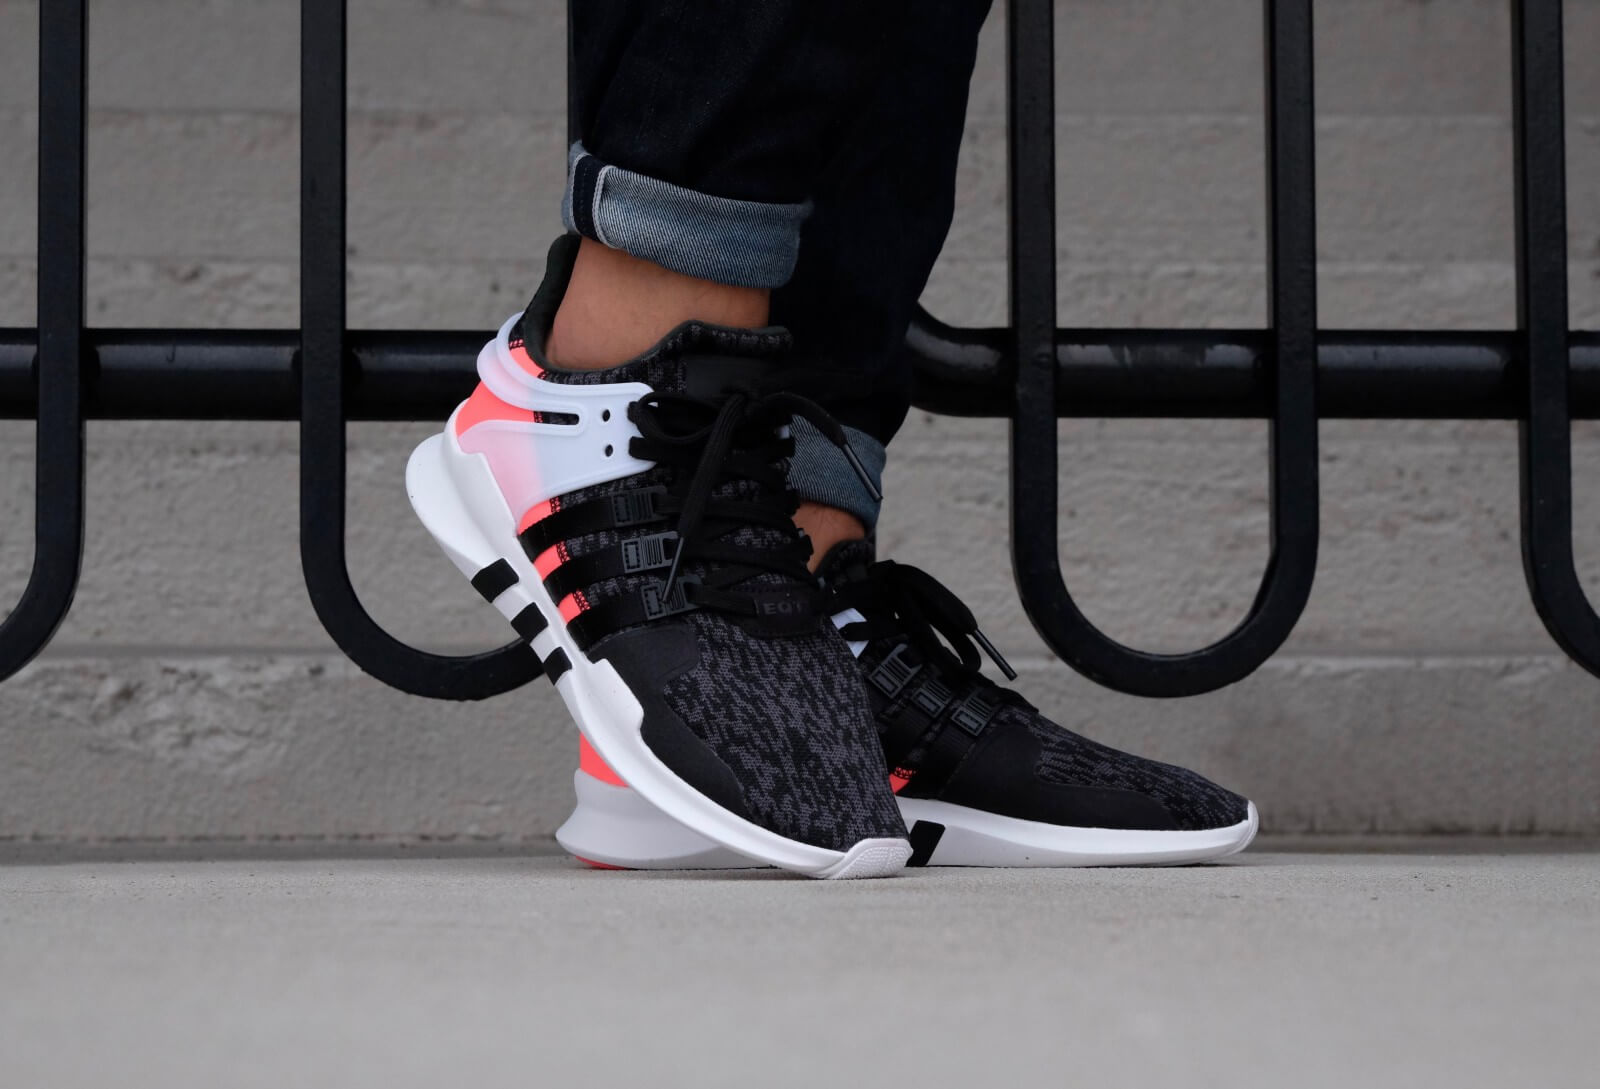 Adidas EQT Support ADV Core Black/White